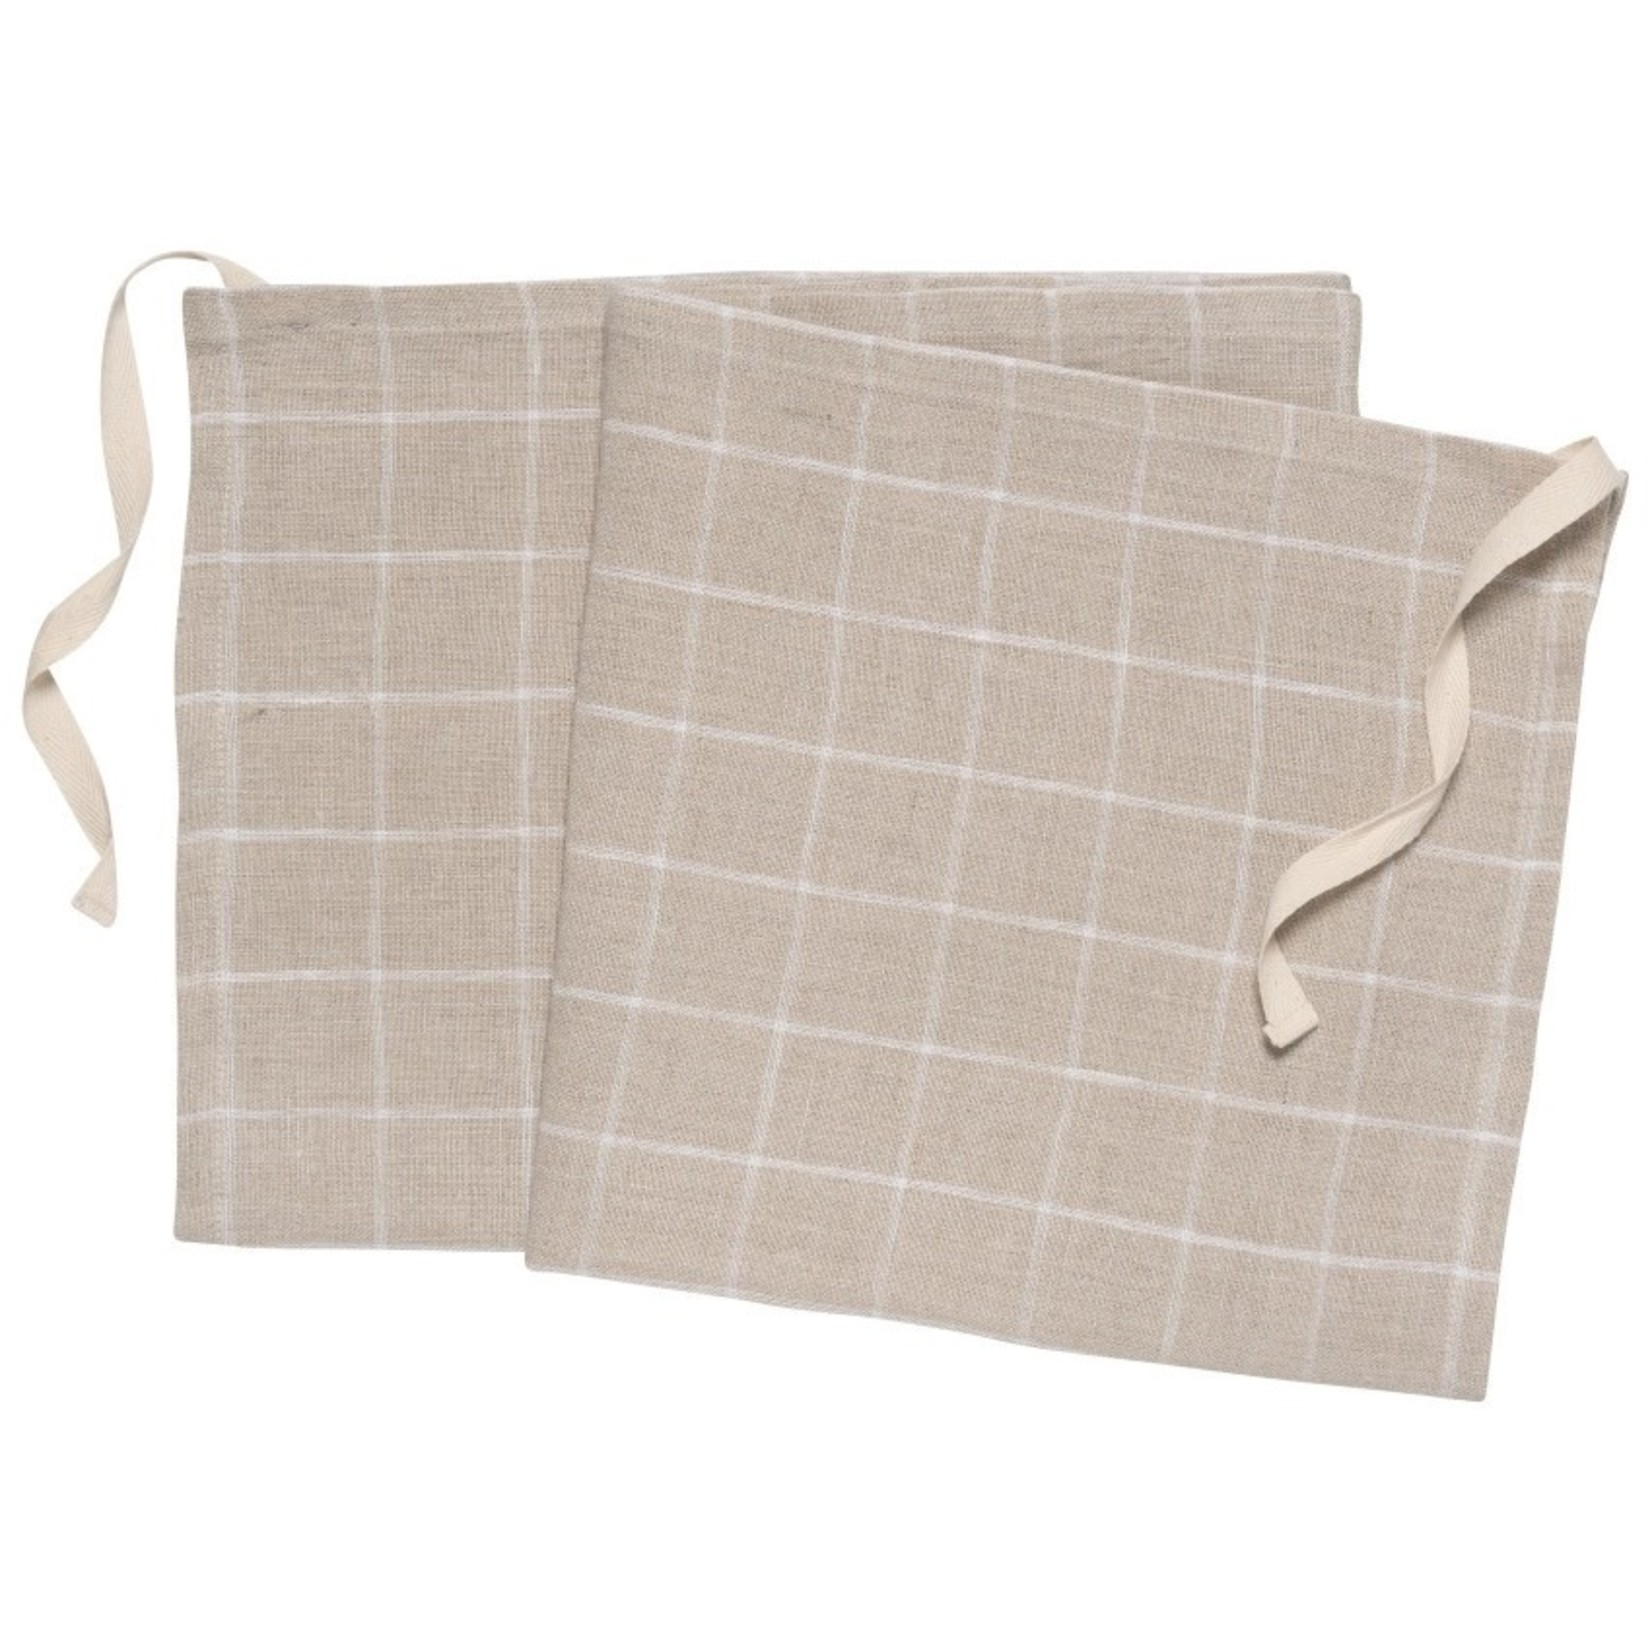 Danica Studio Denman Linen Apron Towel